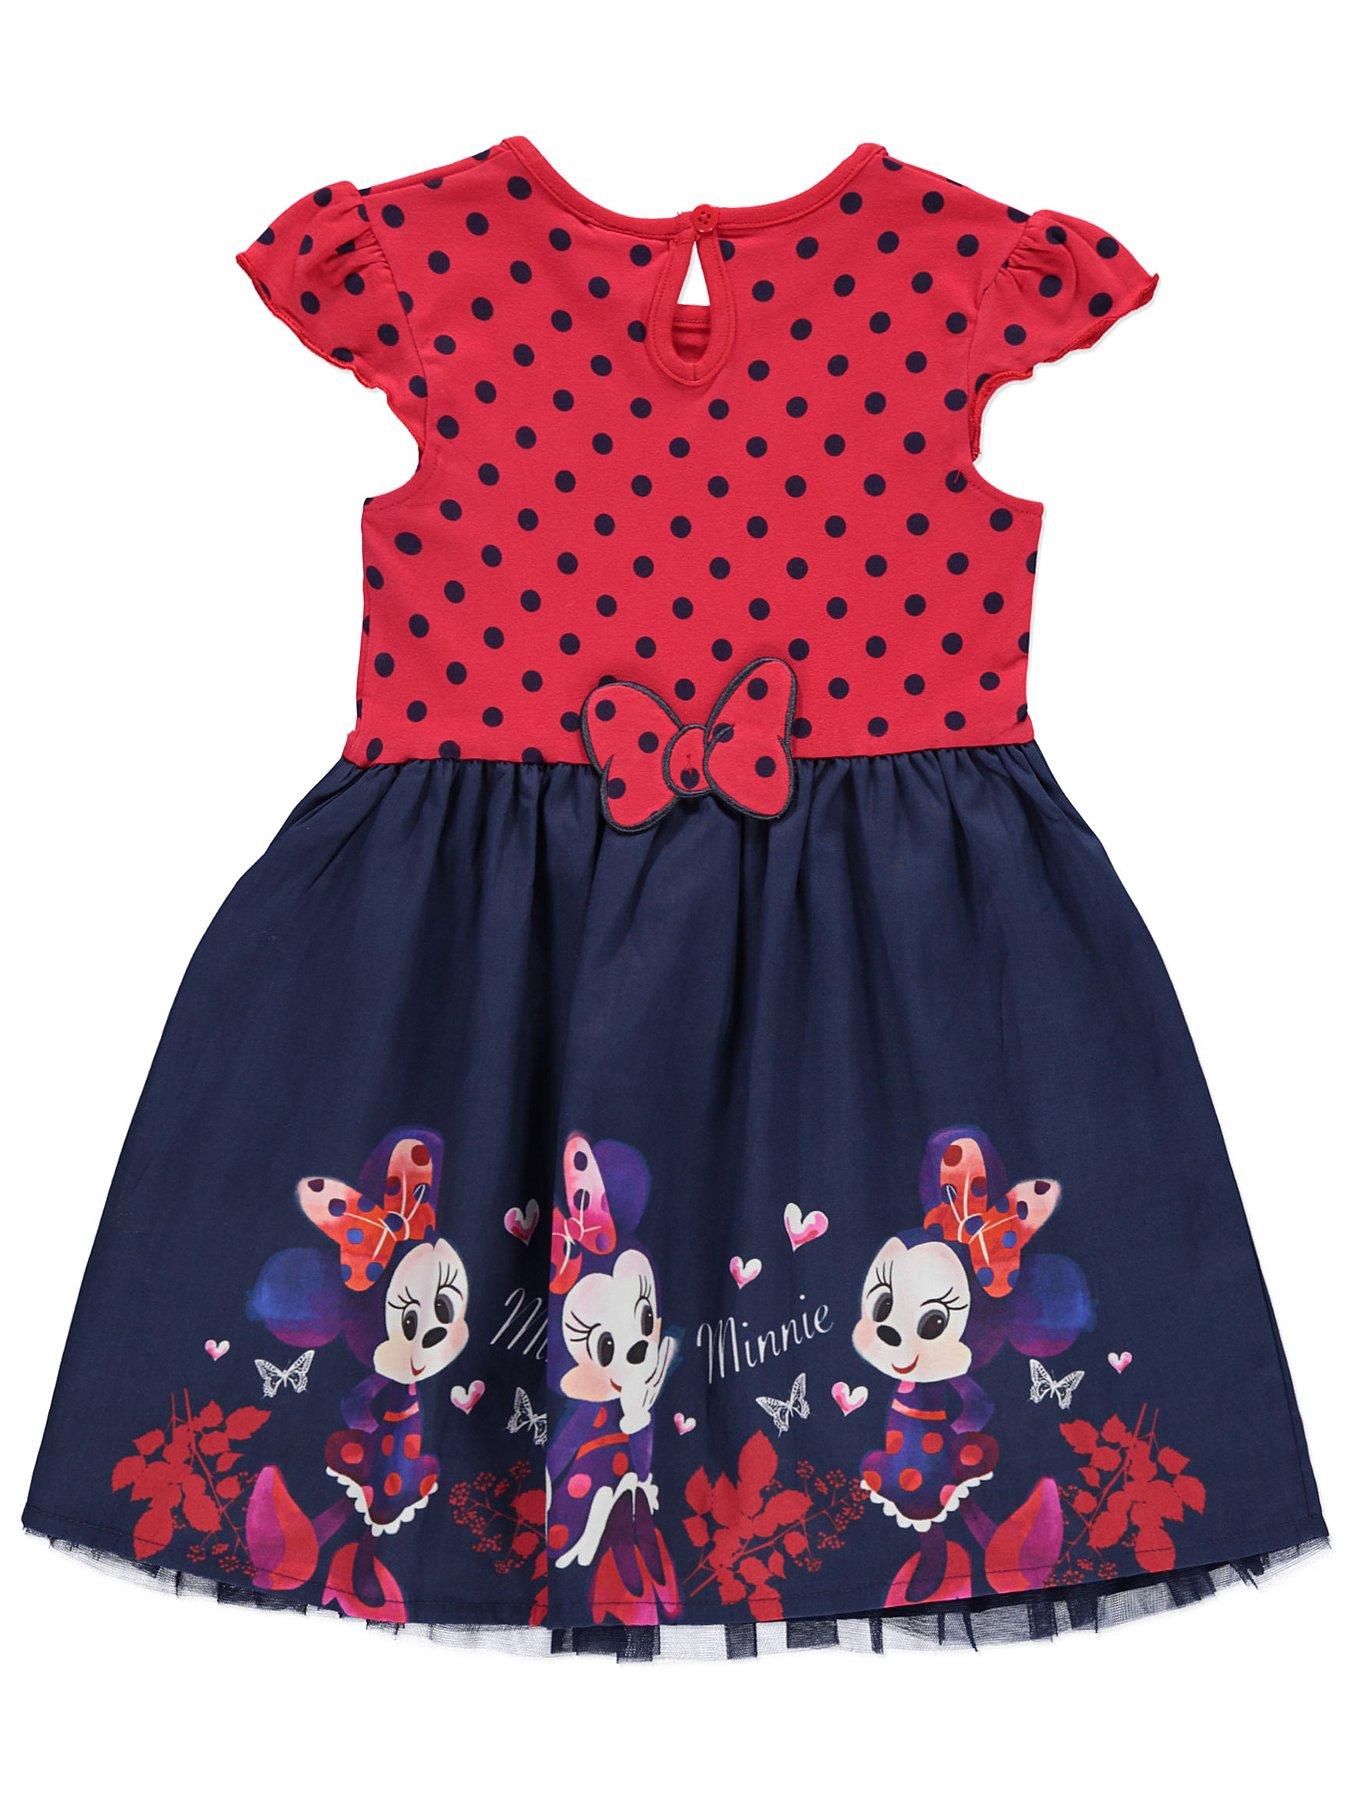 Disney Minnie Mouse Dress and Headband | Kids | George